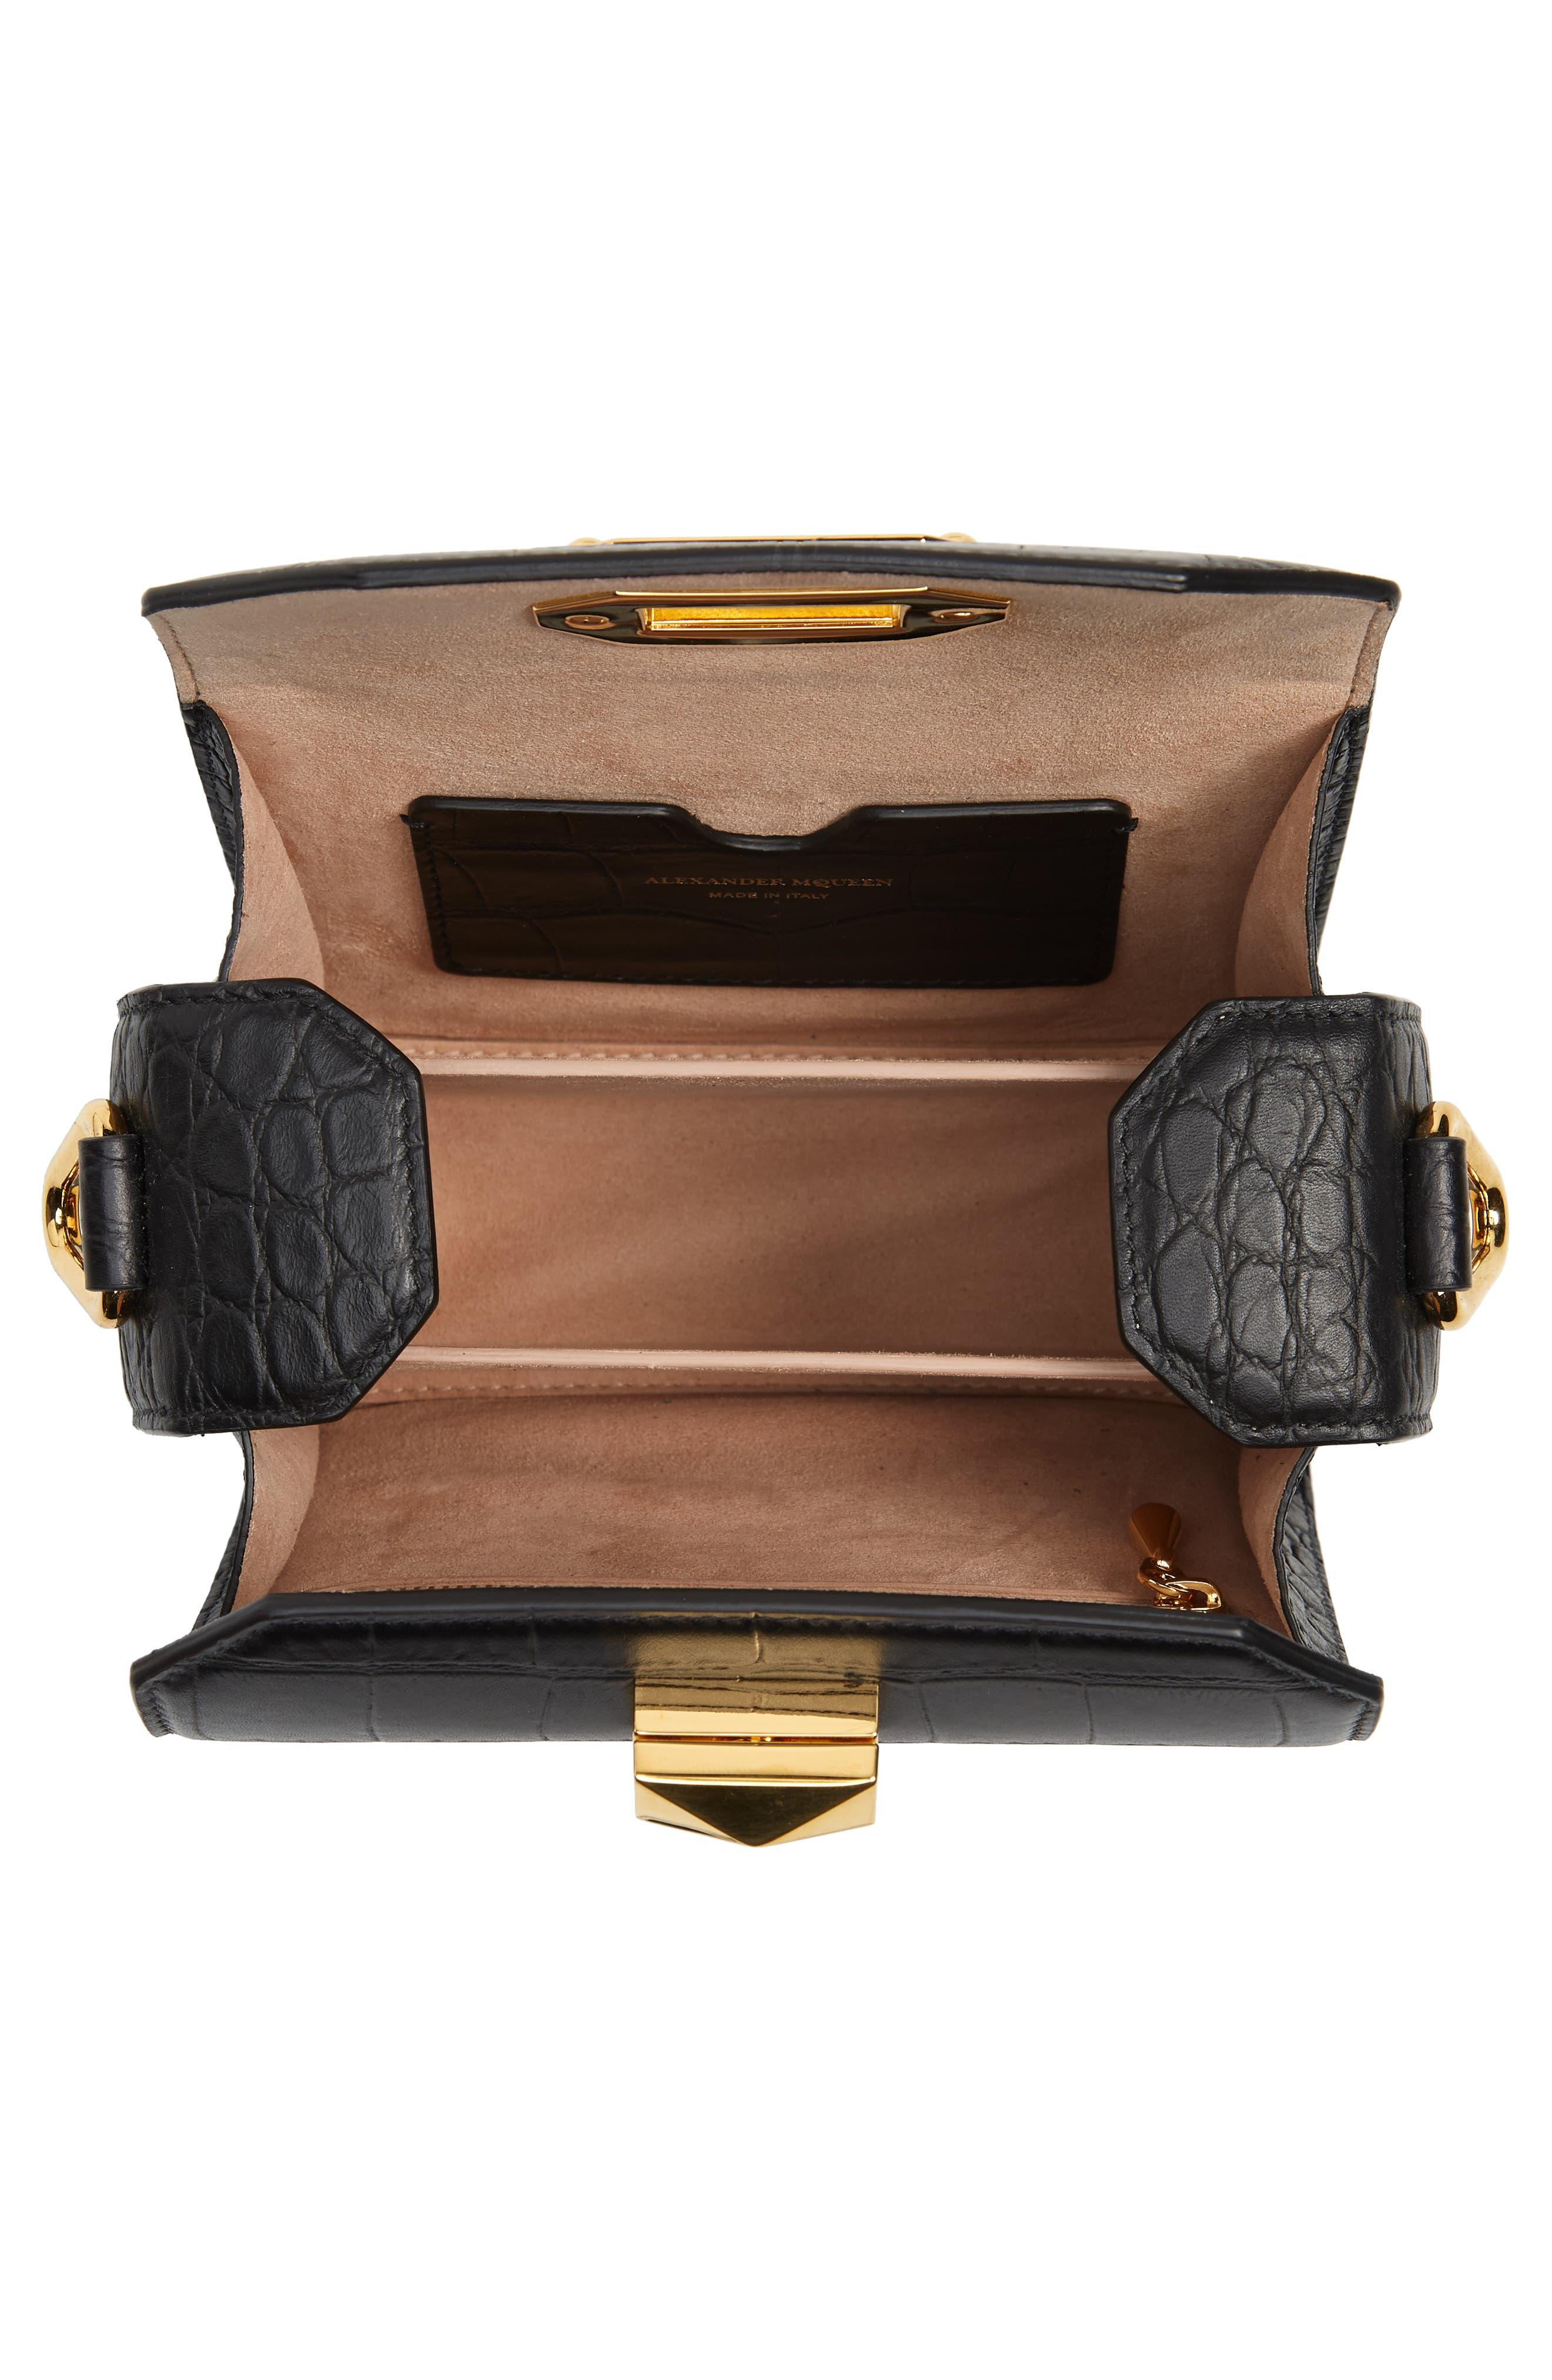 ALEXANDER MCQUEEN,                             Mini Box Croc-Embossed Leather Bag,                             Alternate thumbnail 5, color,                             001